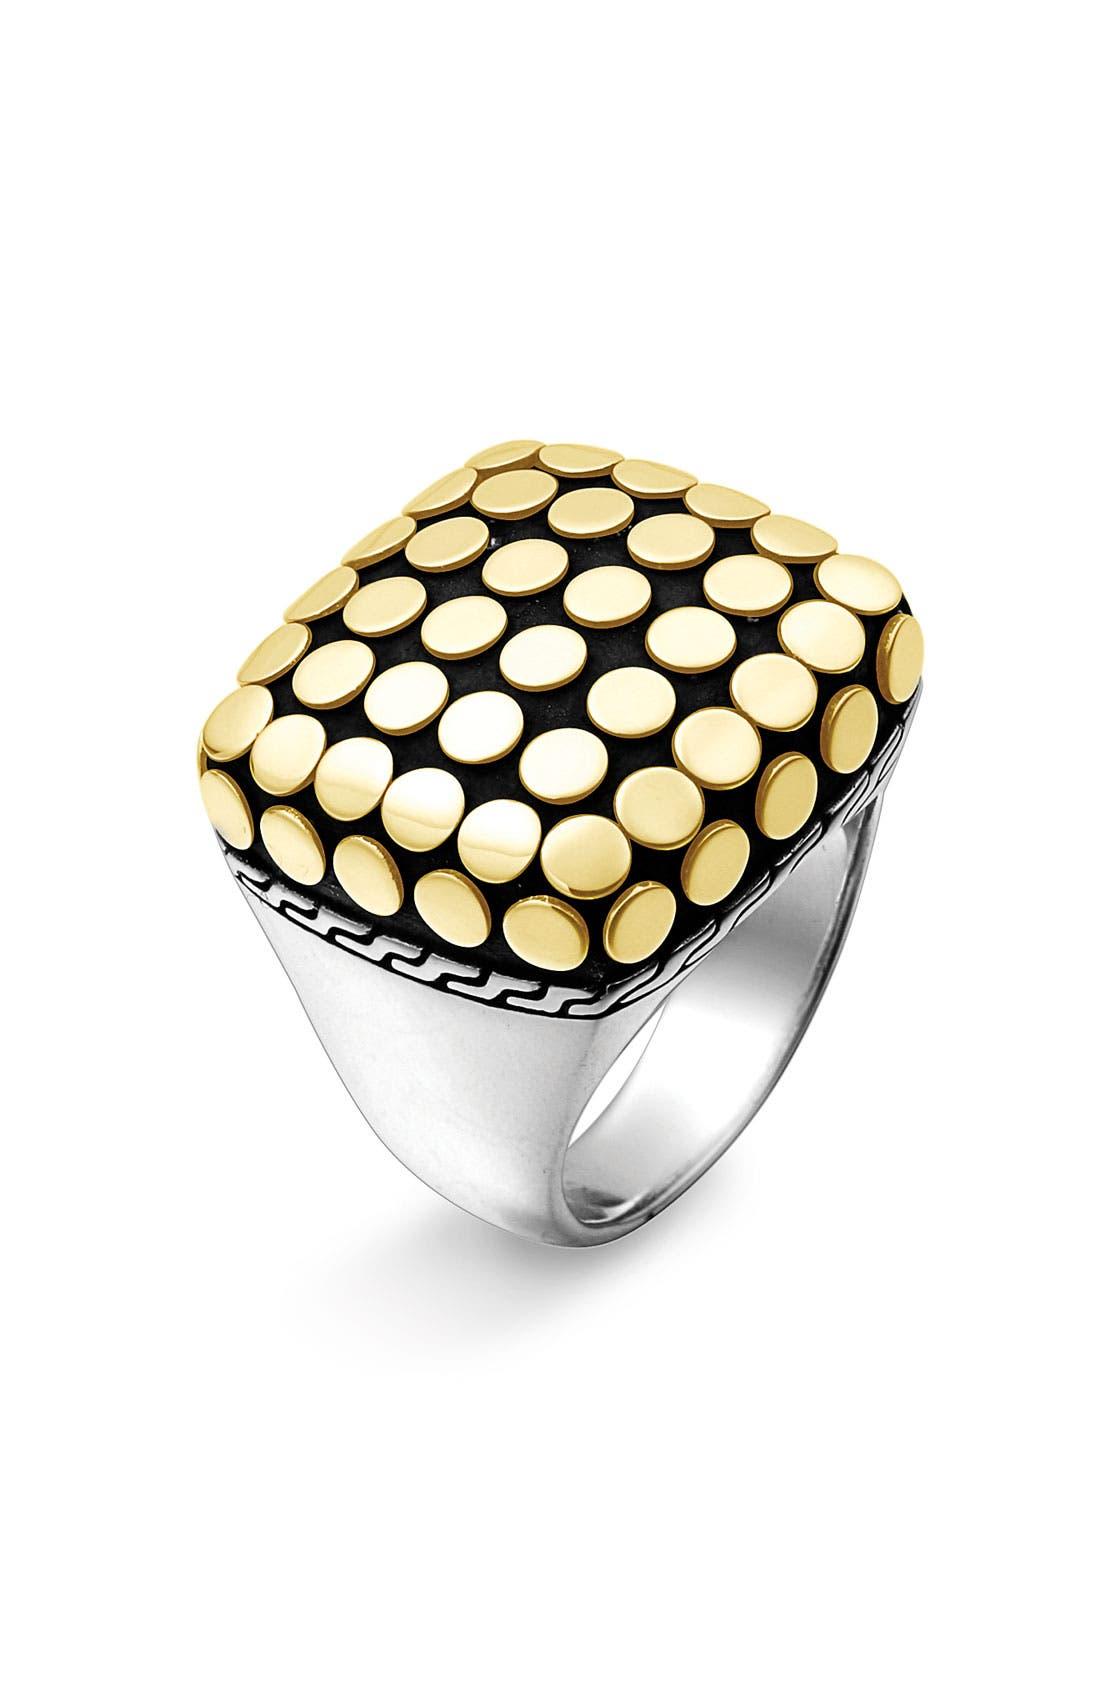 Main Image - John Hardy 'Dot Gold' Square Ring